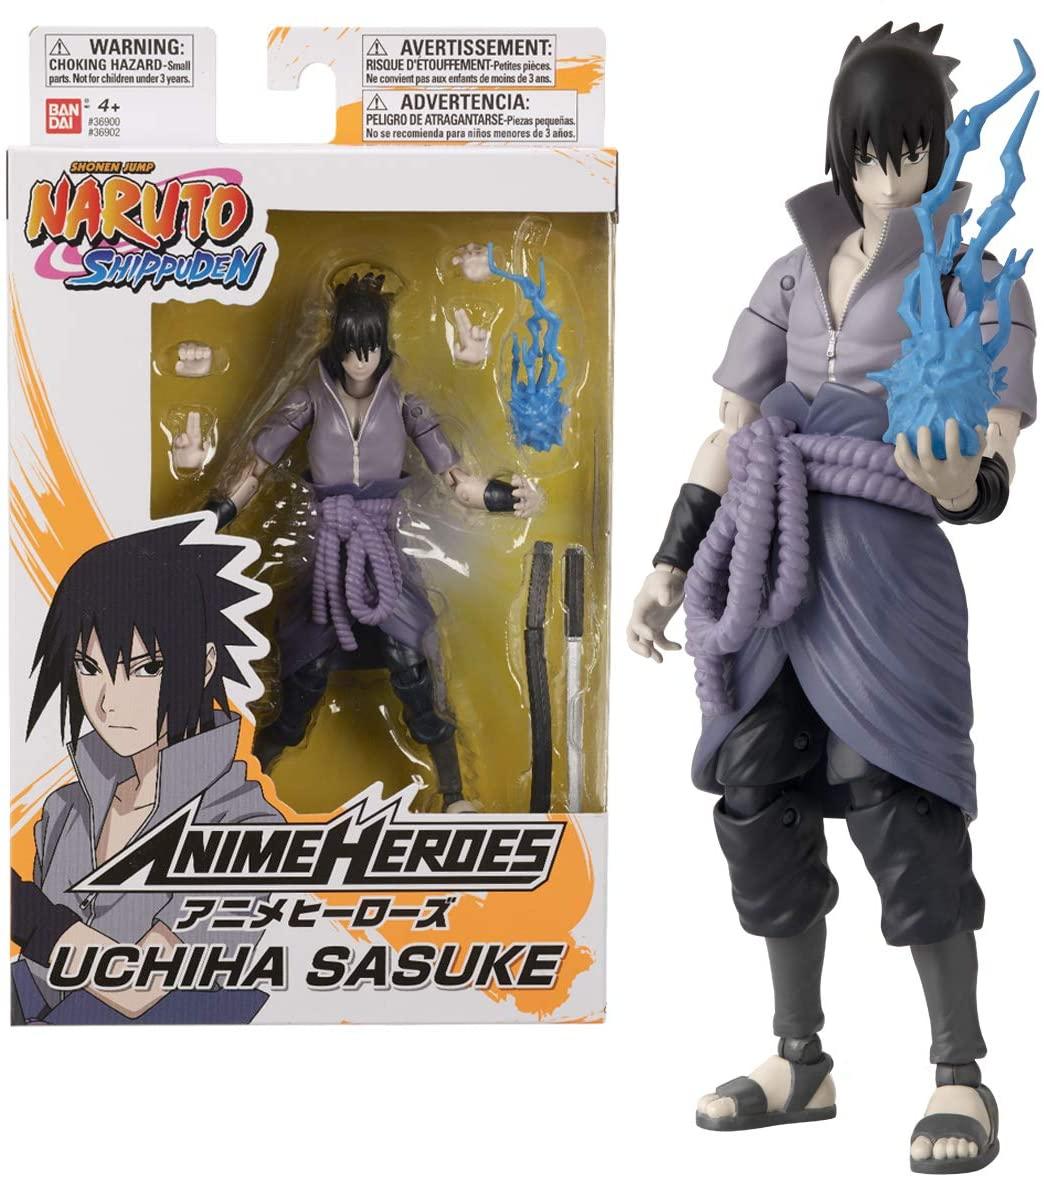 Action Figure: Sasuke Uchiha: Naruto Shippuden (Anime Heroes) Anime Mangá - Bandai